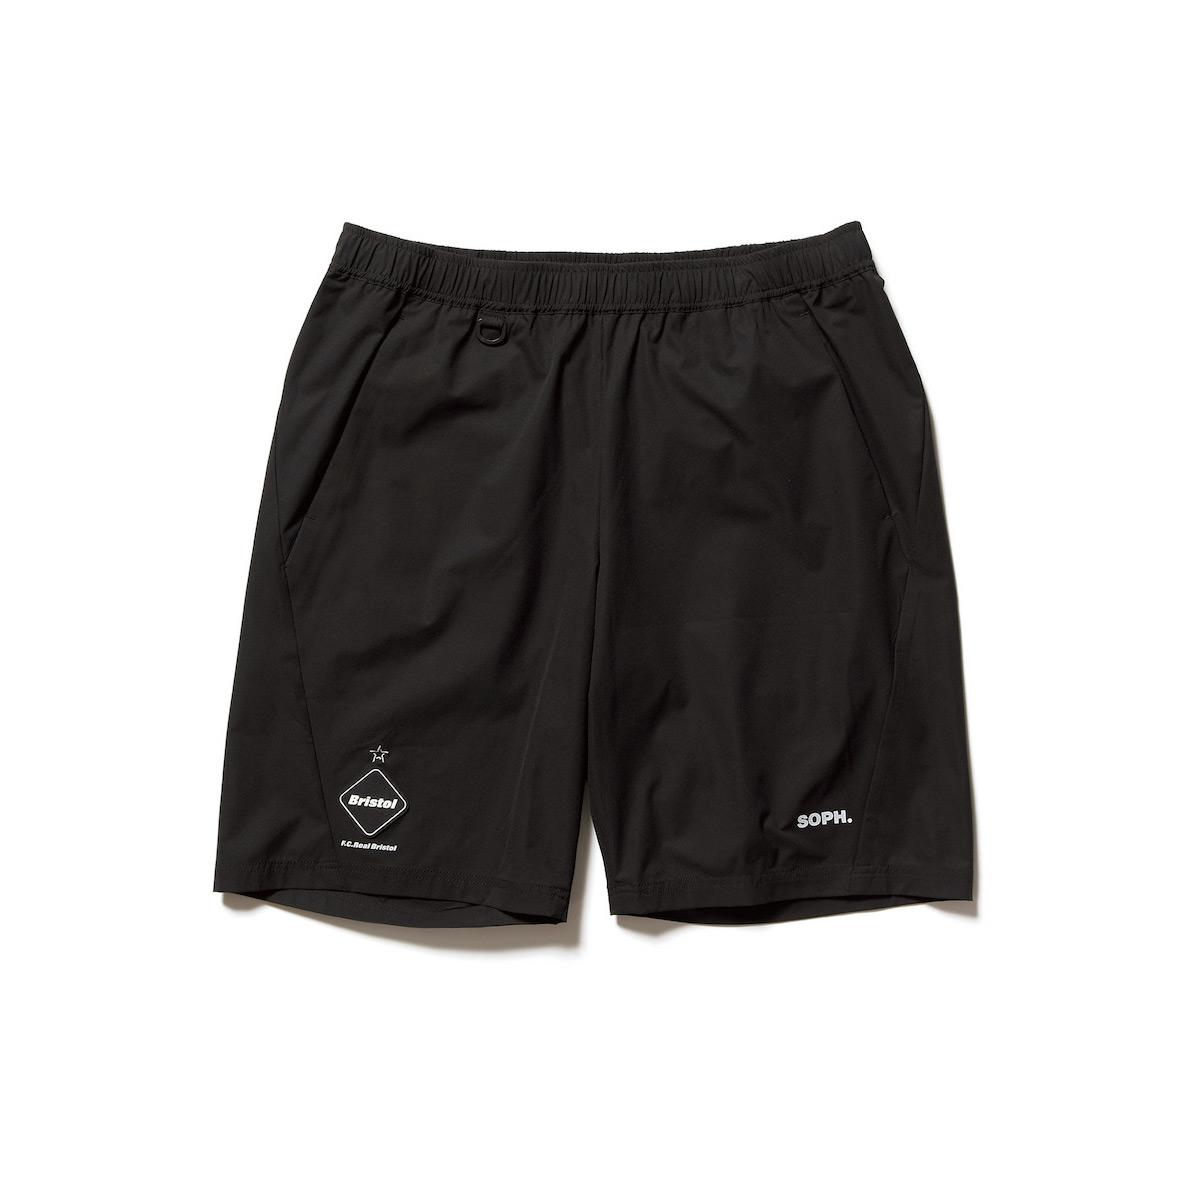 F.C.Real Bristol / GAME SHORTS (Black)